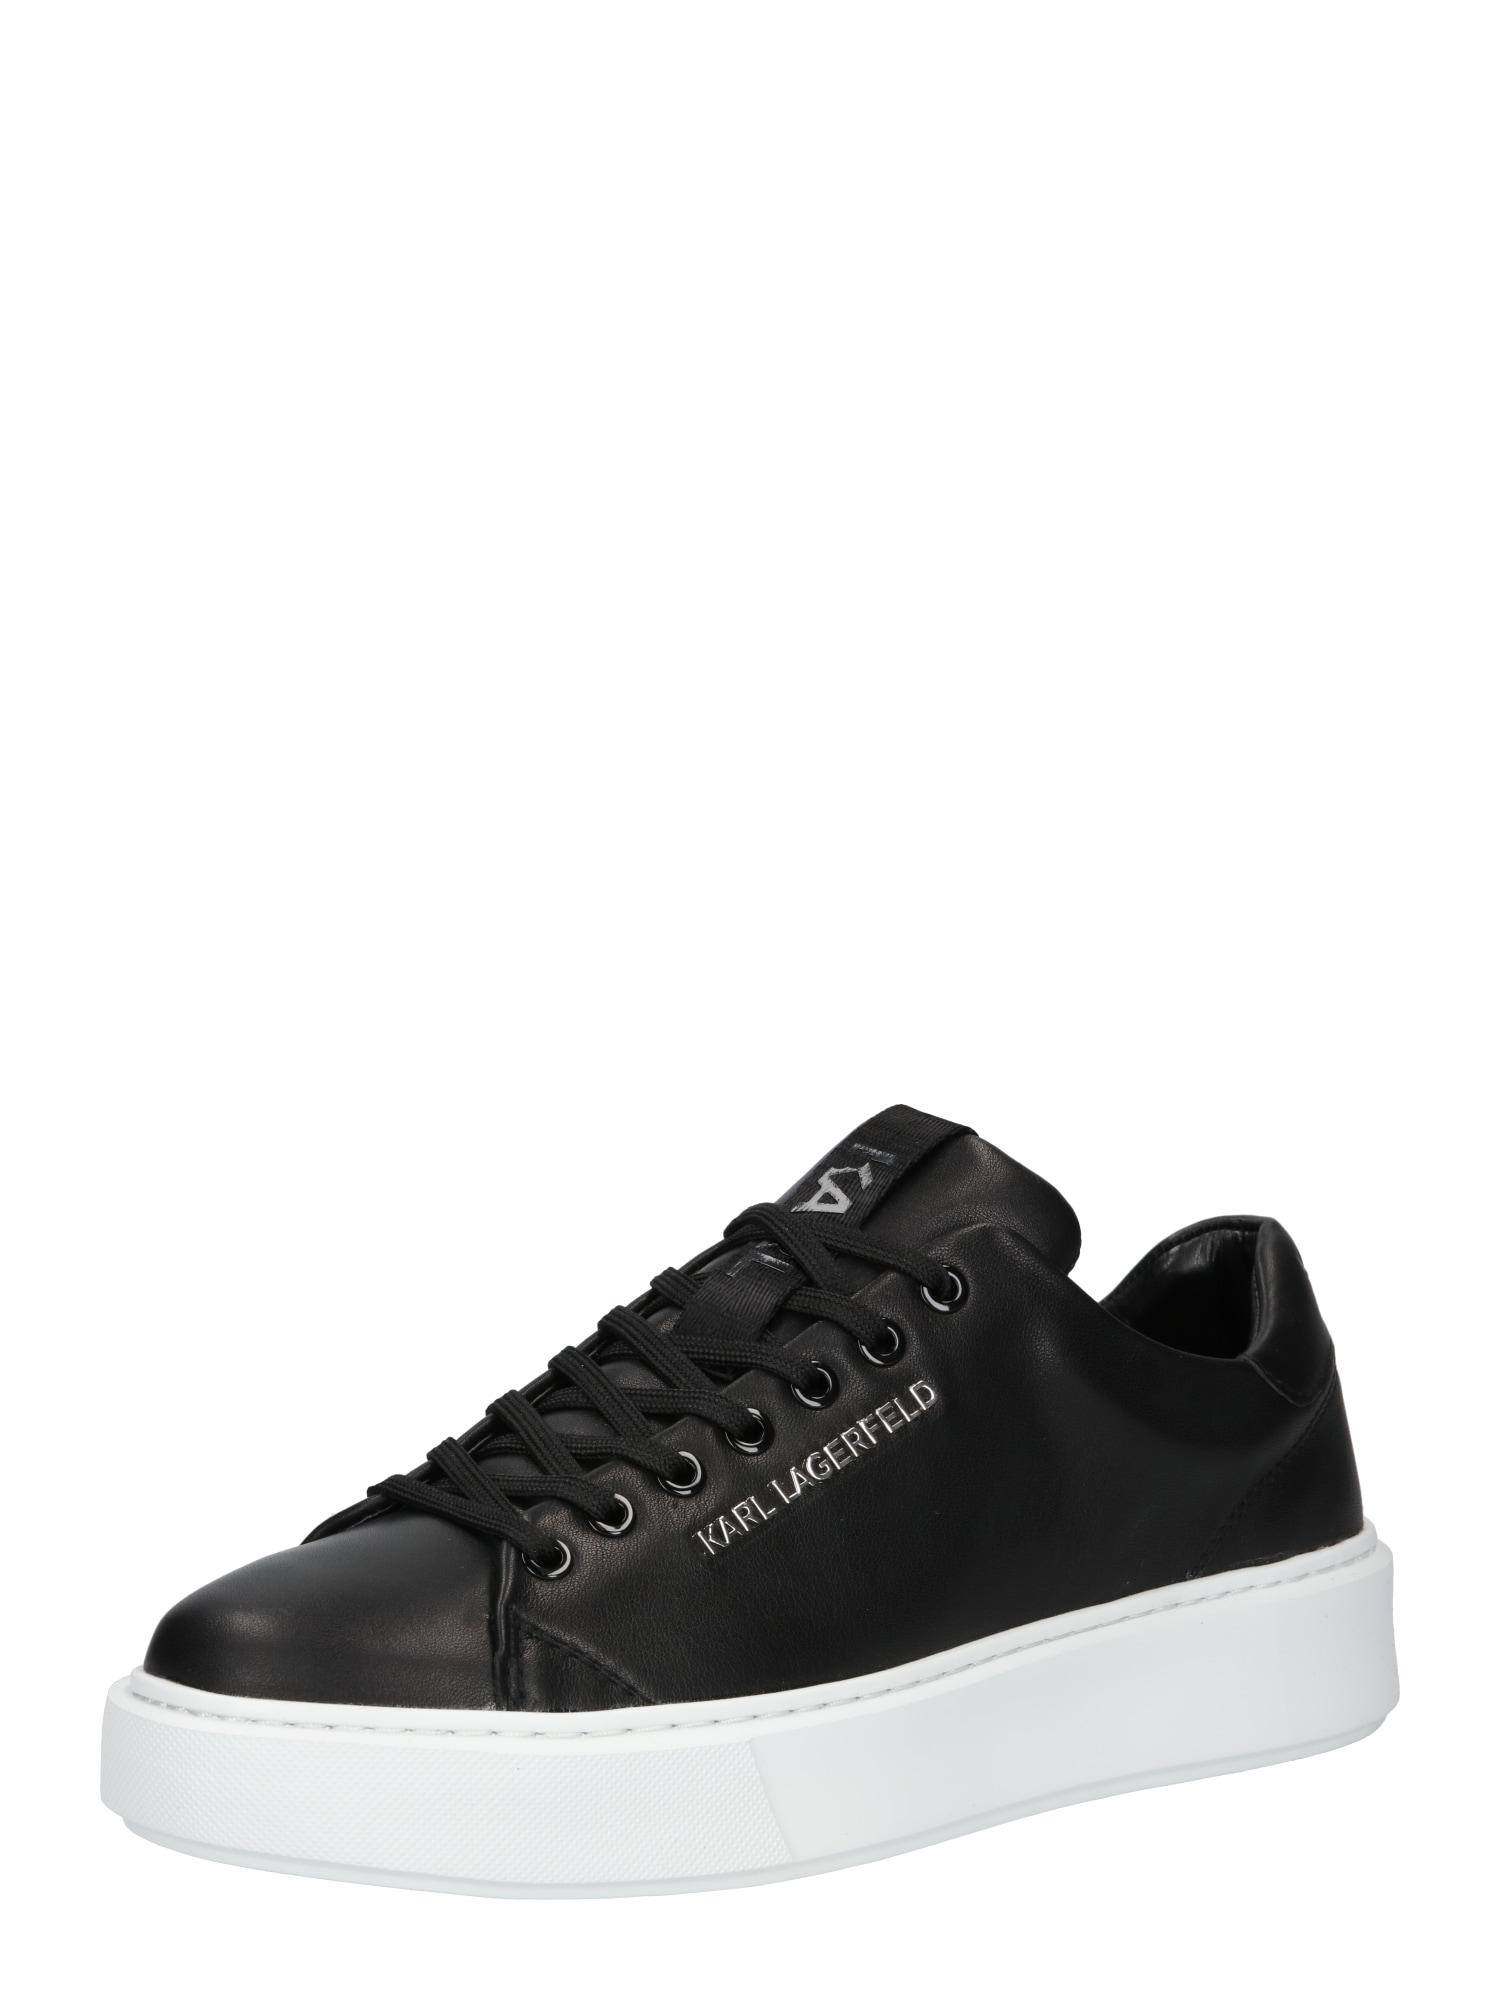 Karl Lagerfeld Nízke tenisky 'Maxi Kup'  čierna